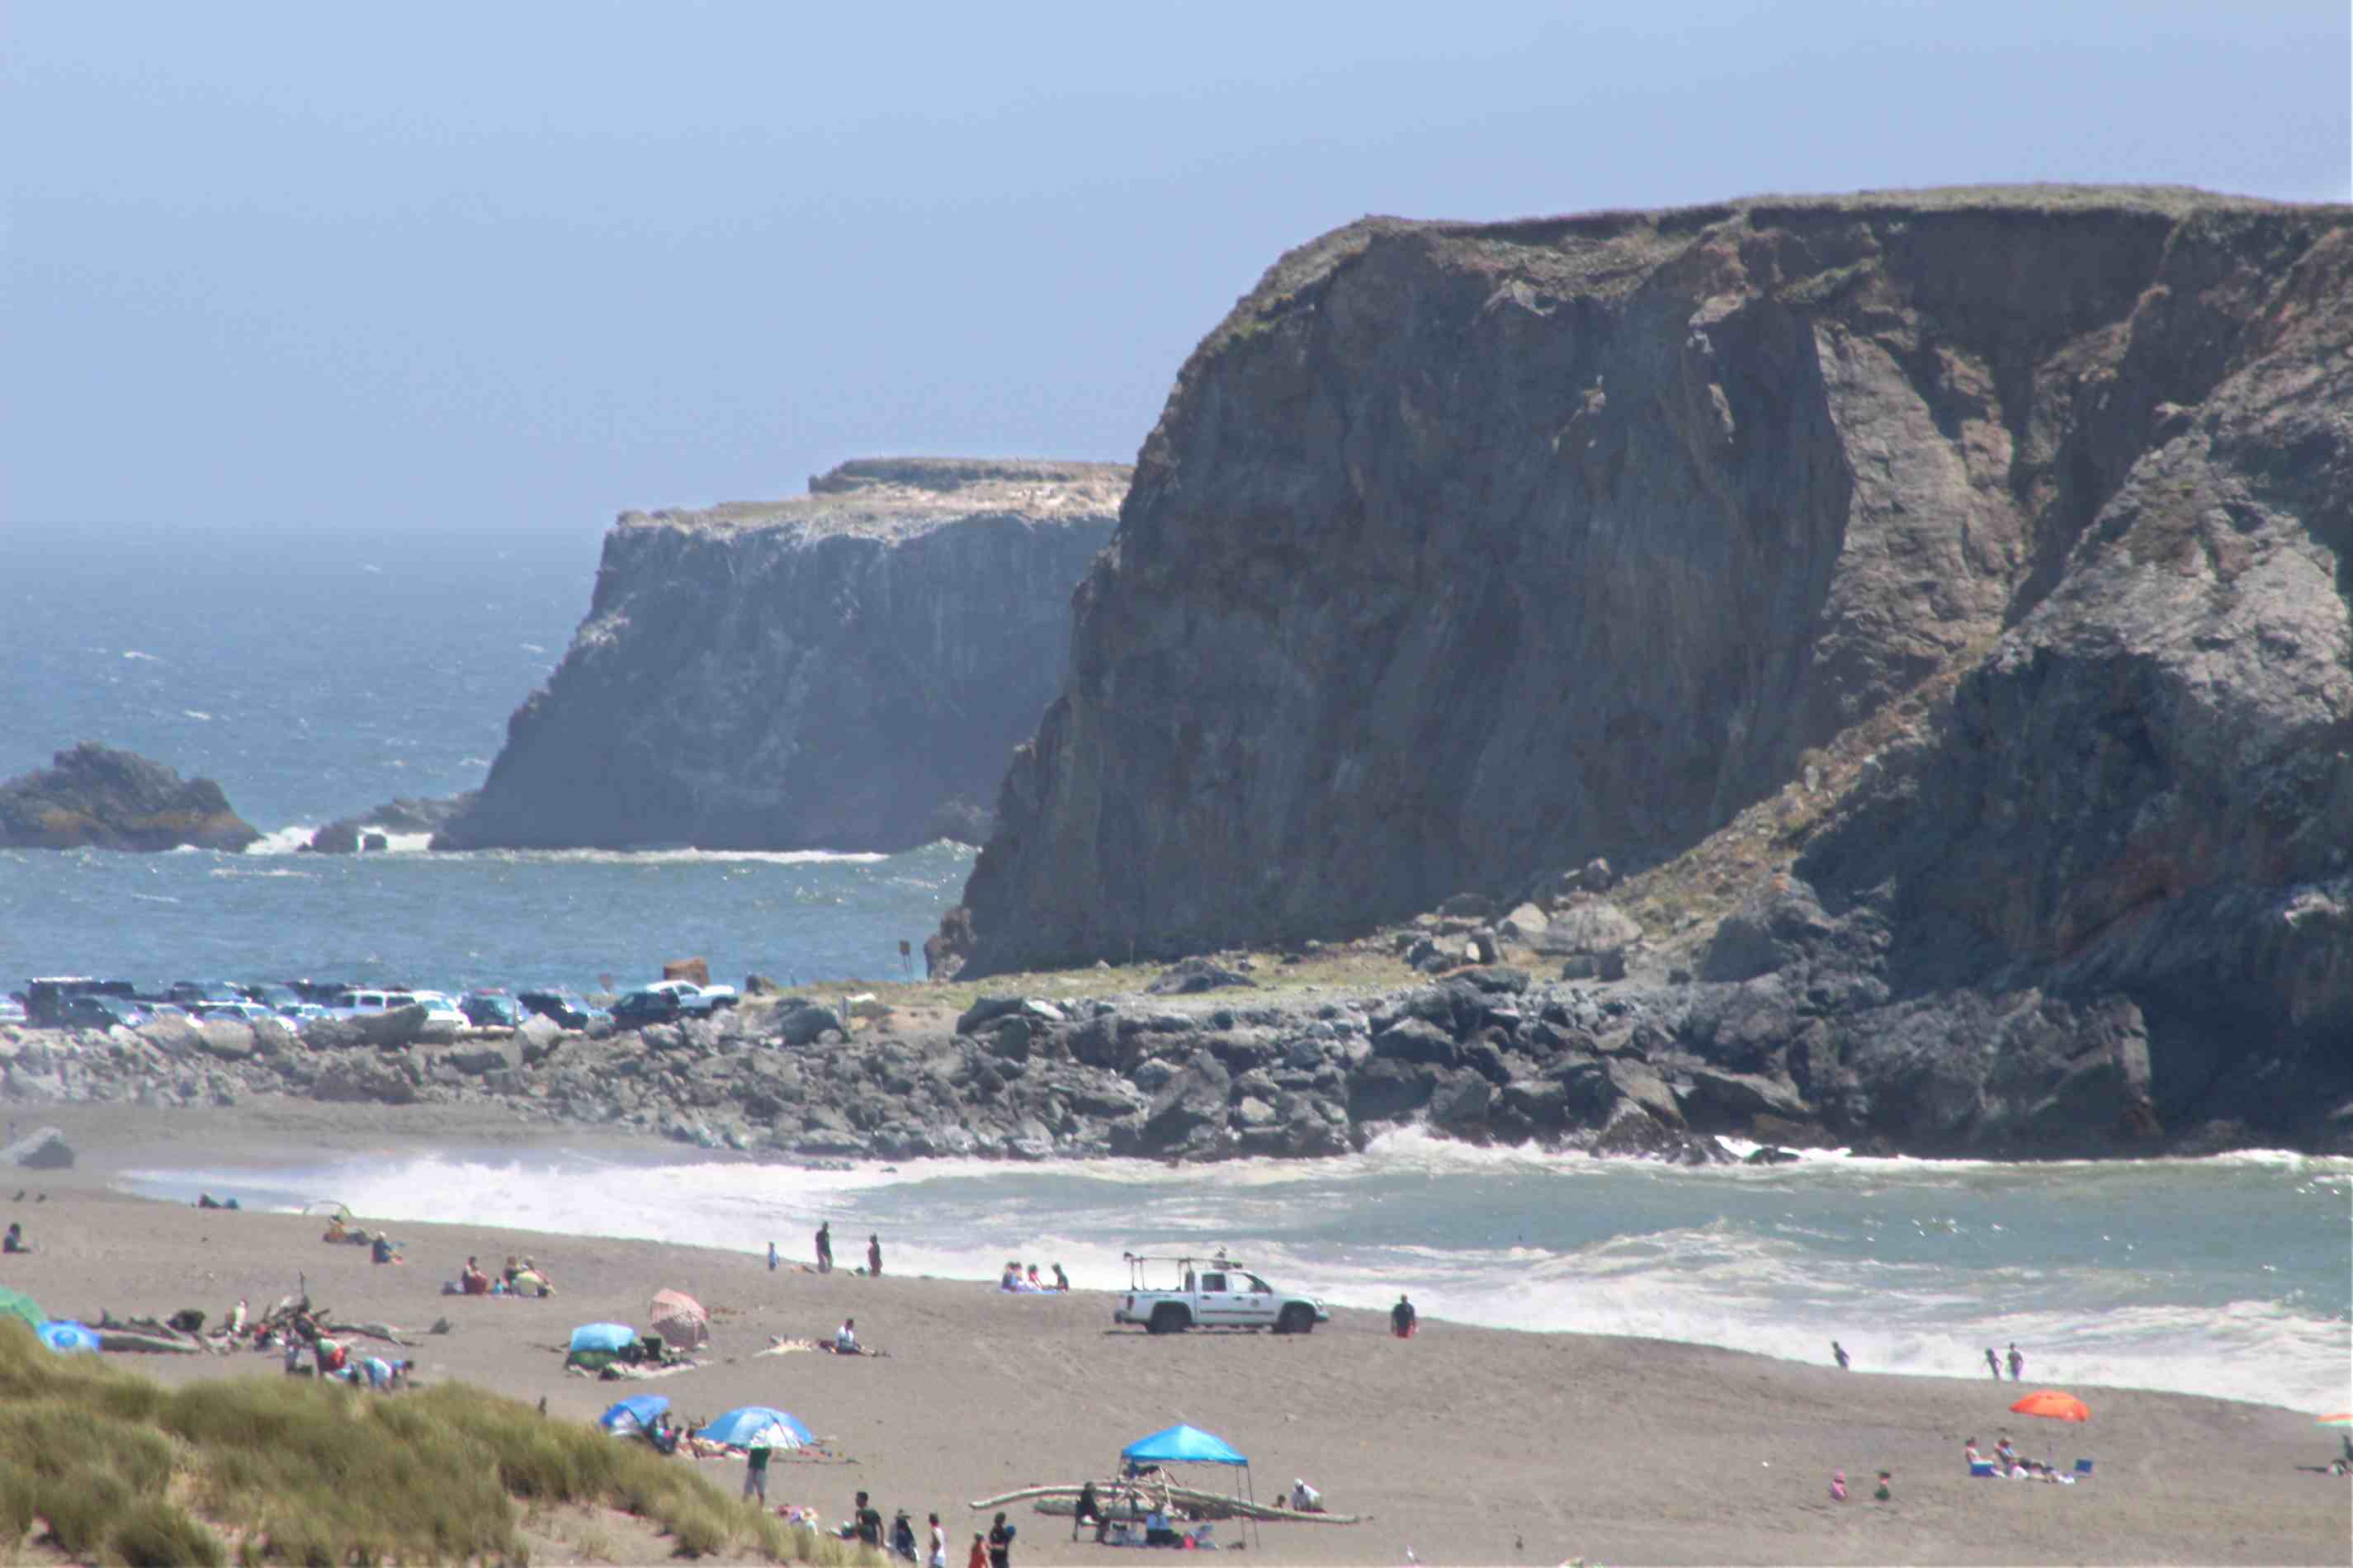 Bodega Bay, California / Goat Rock Beach